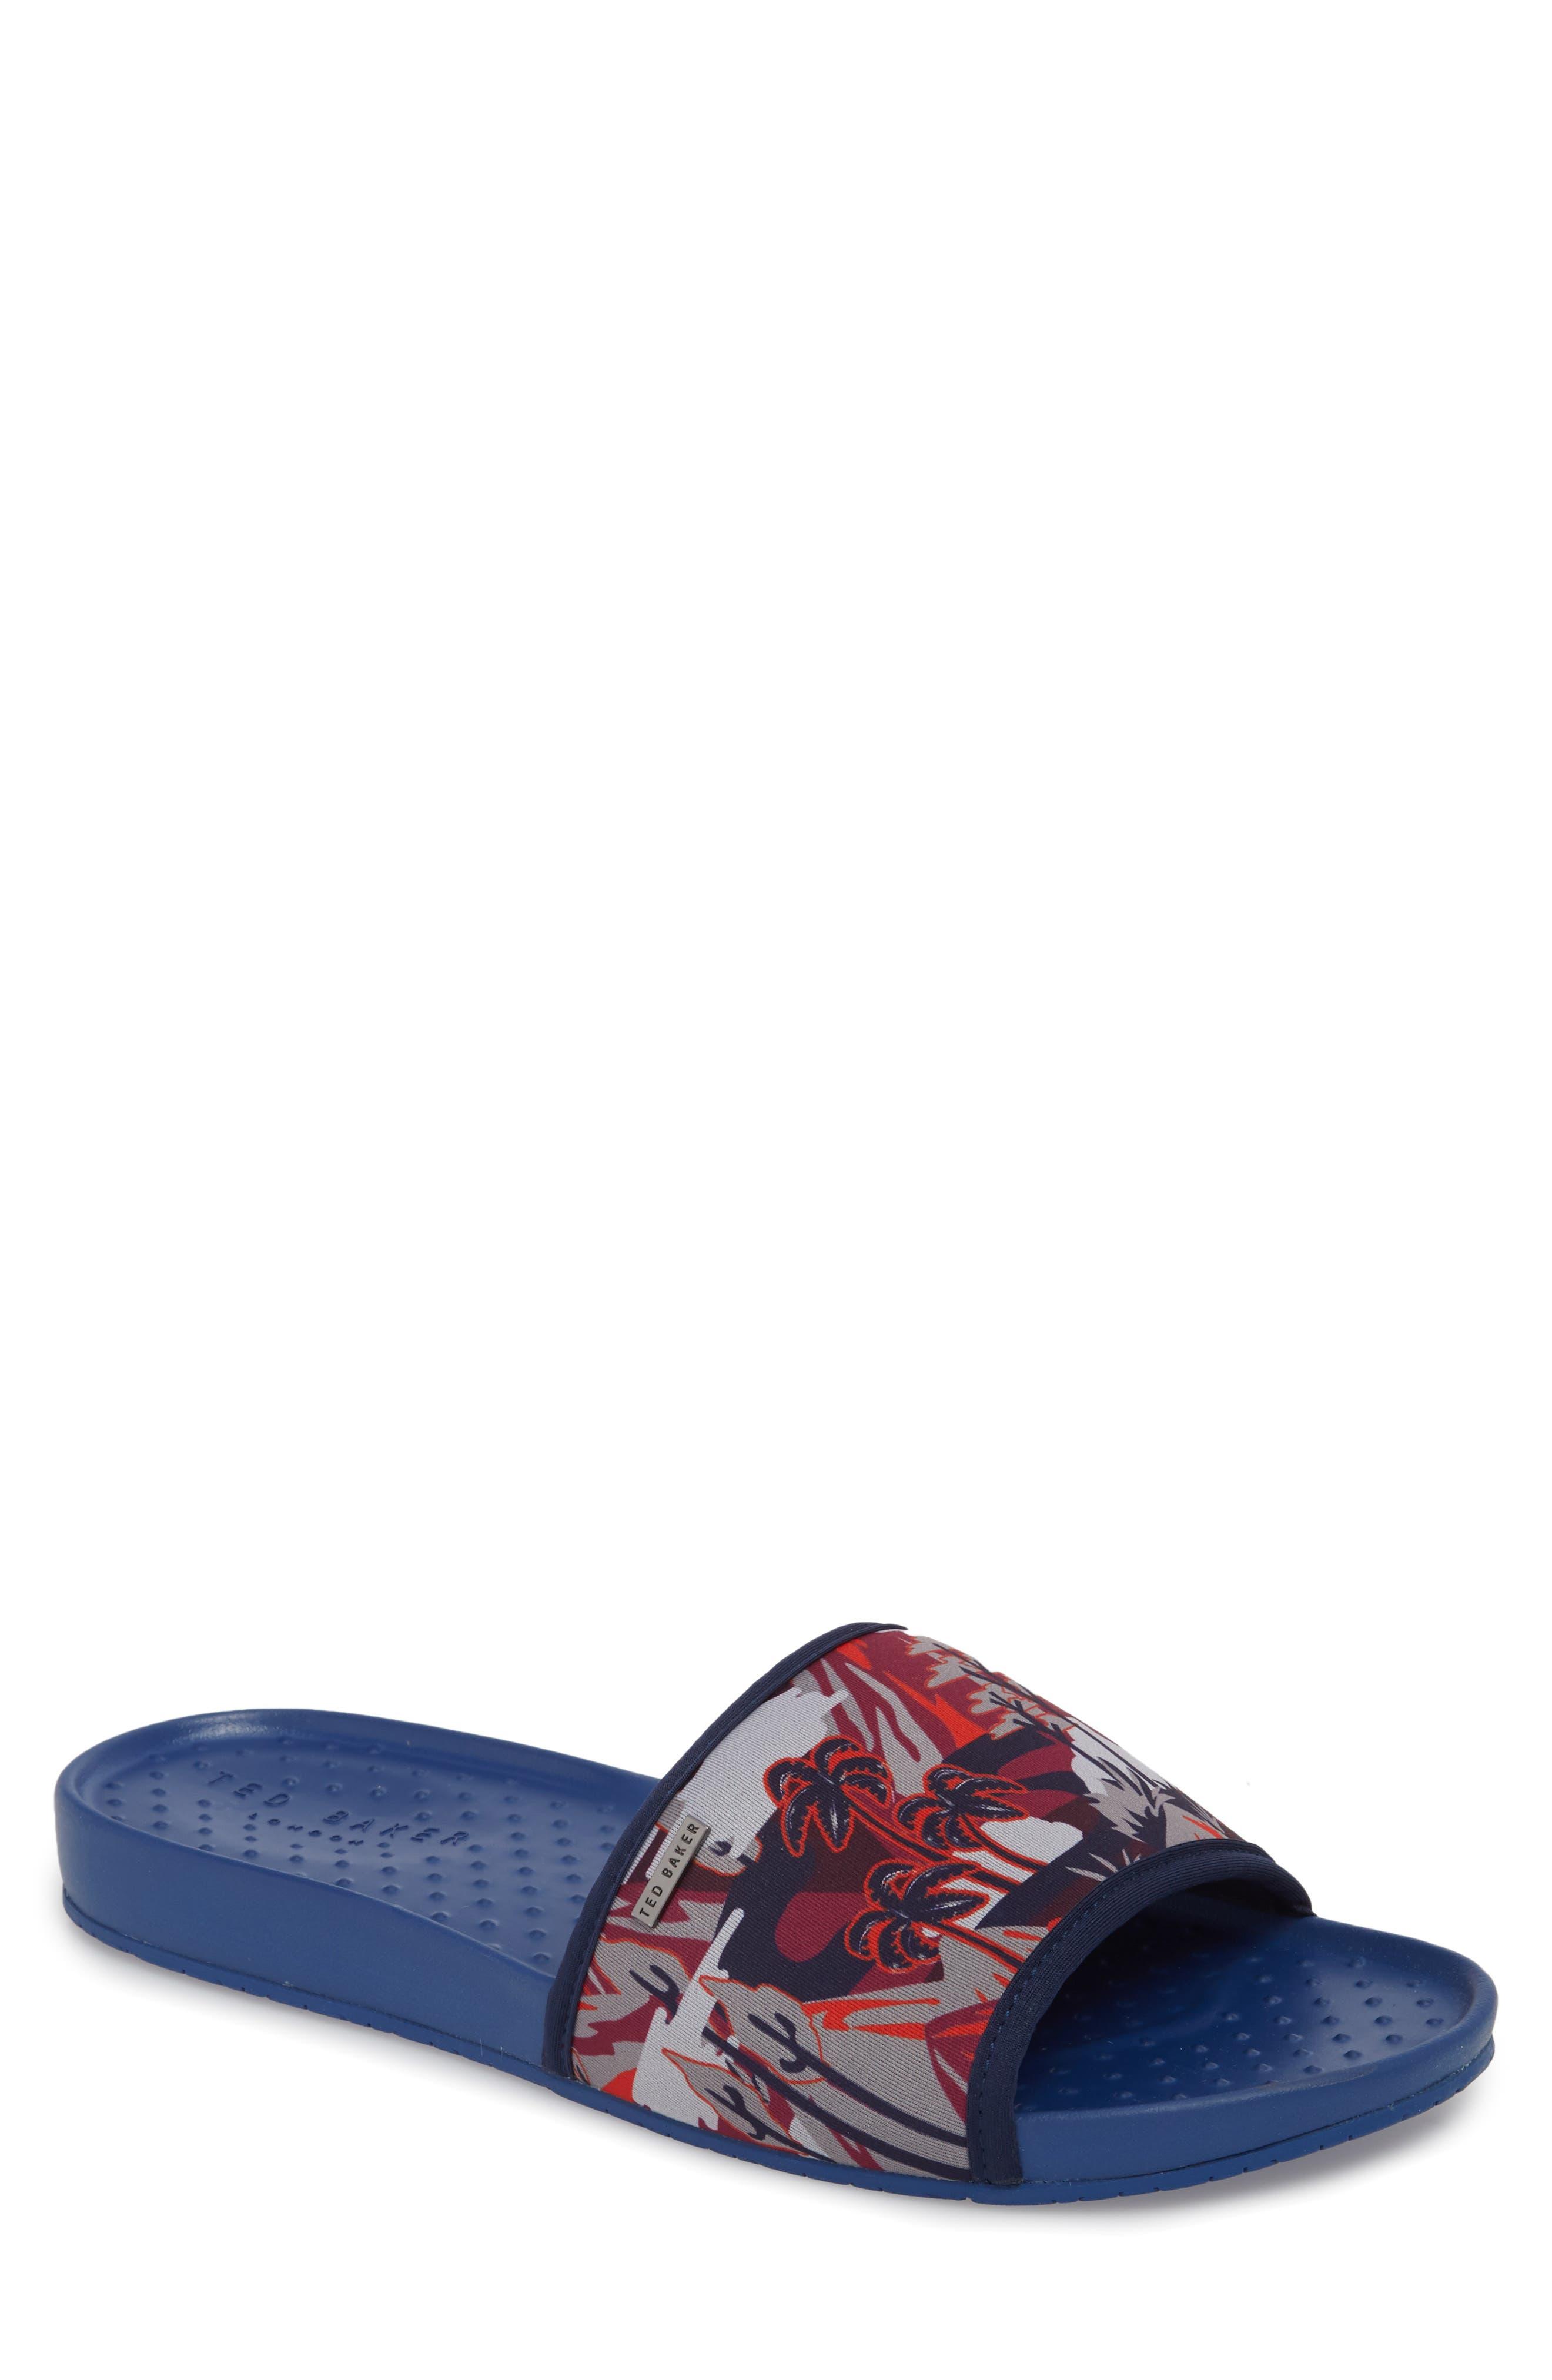 Sauldi 2 Slide Sandal,                             Main thumbnail 1, color,                             Dark Blue